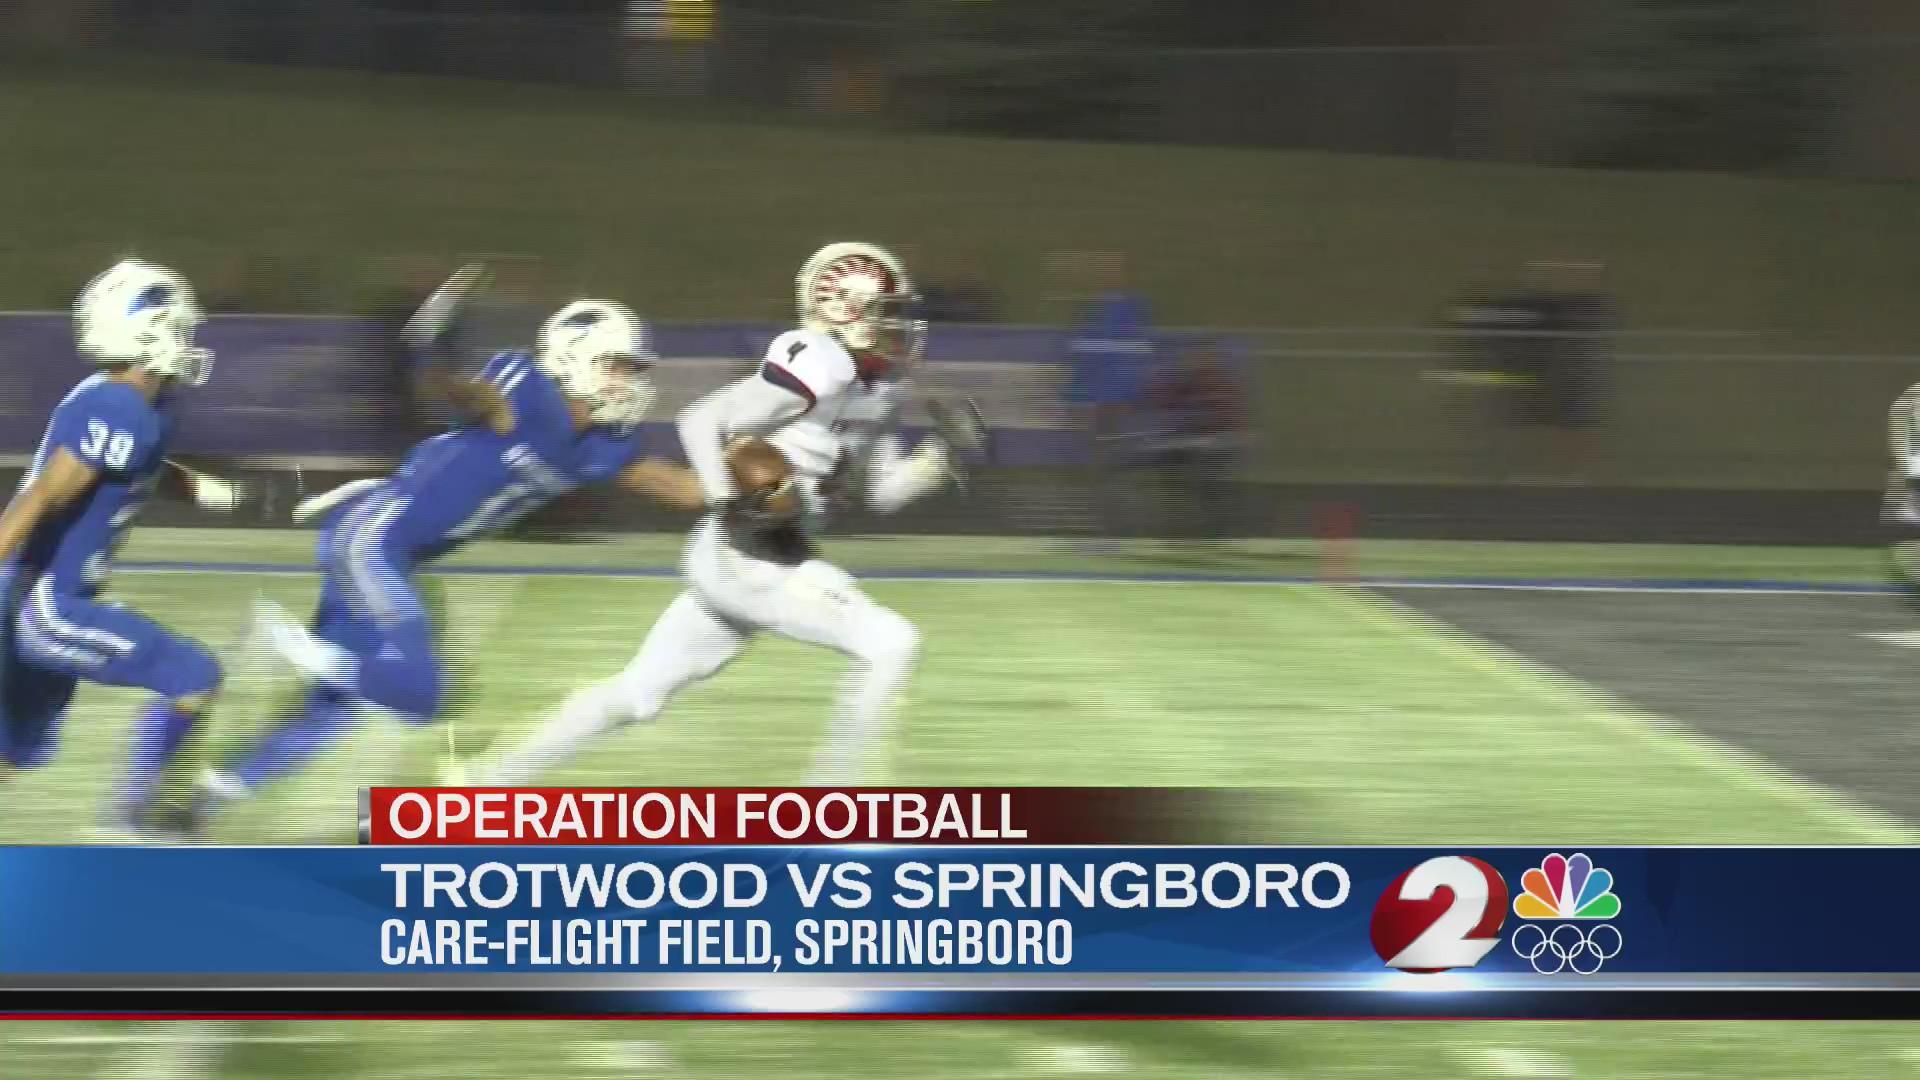 Trotwood vs Springboro